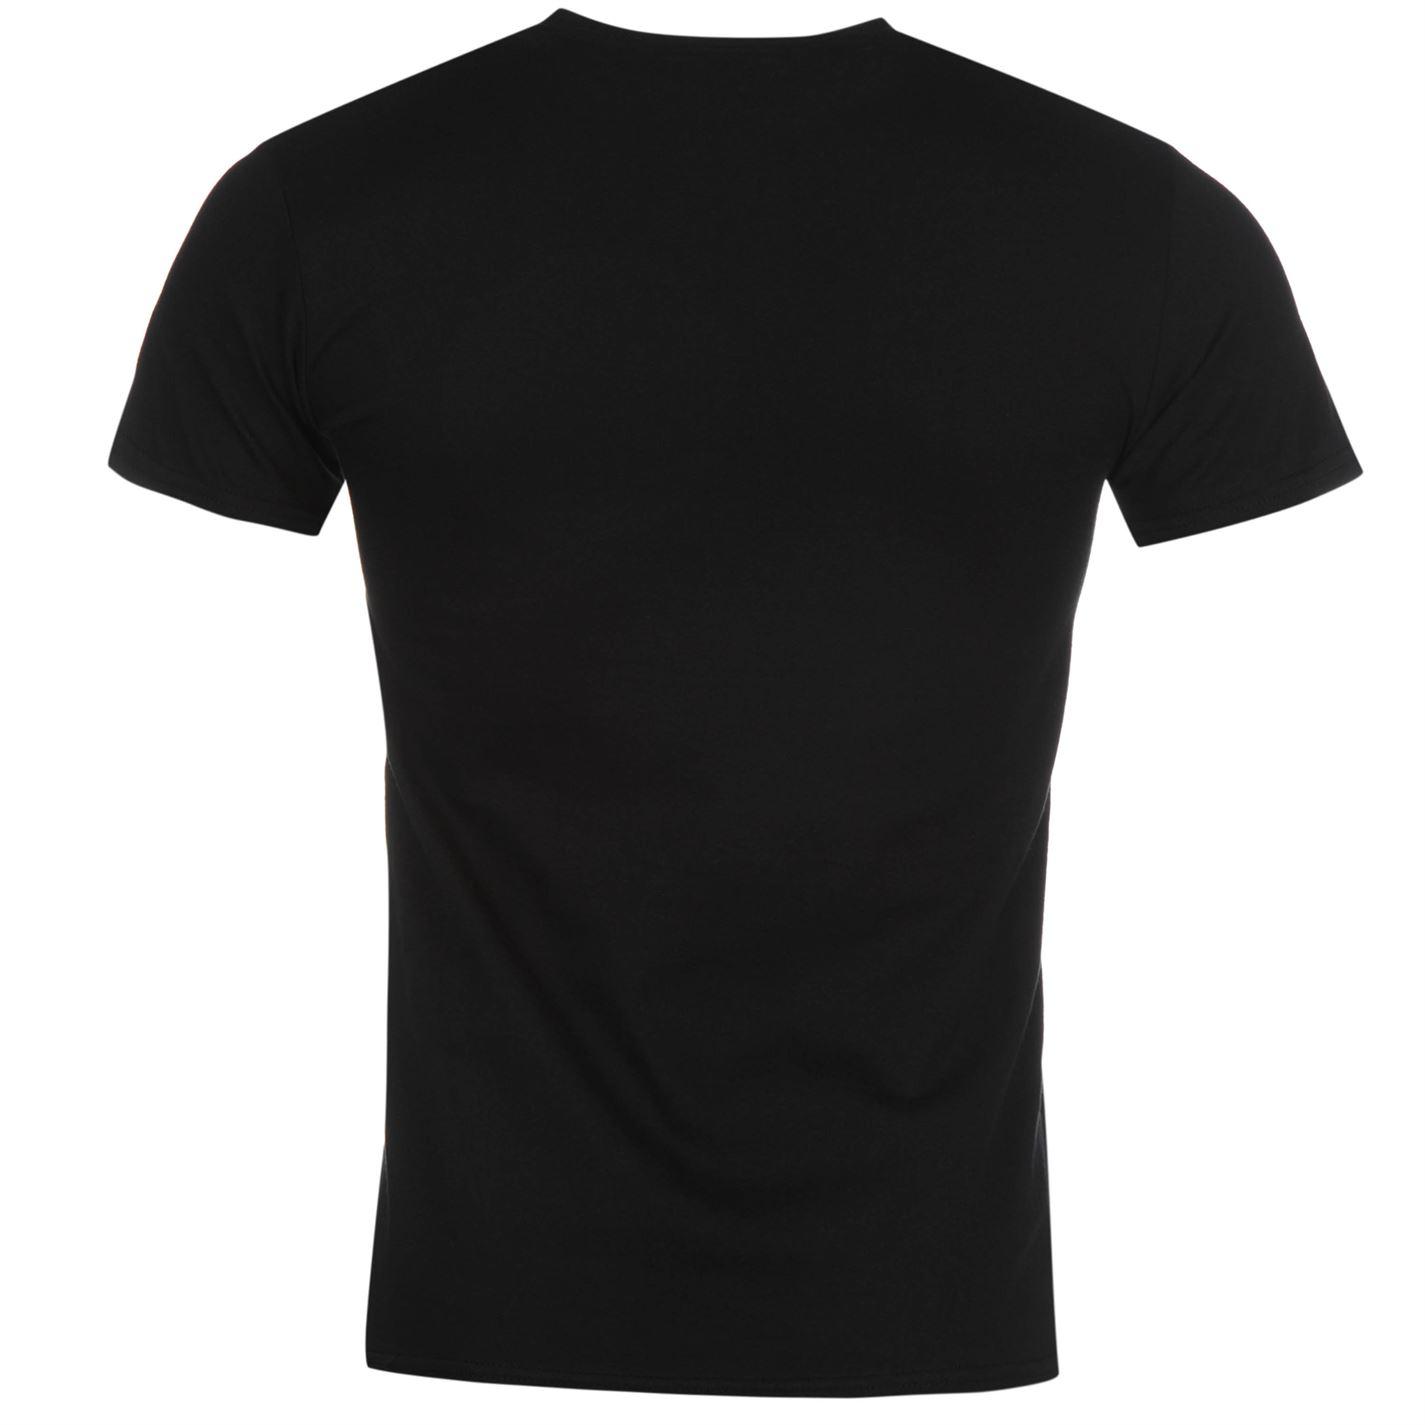 Los-asesinos-Camiseta-Oficial-Para-Hombre-Manga-Corta-Redondo-Informal-Estampado-Camiseta-Top miniatura 4